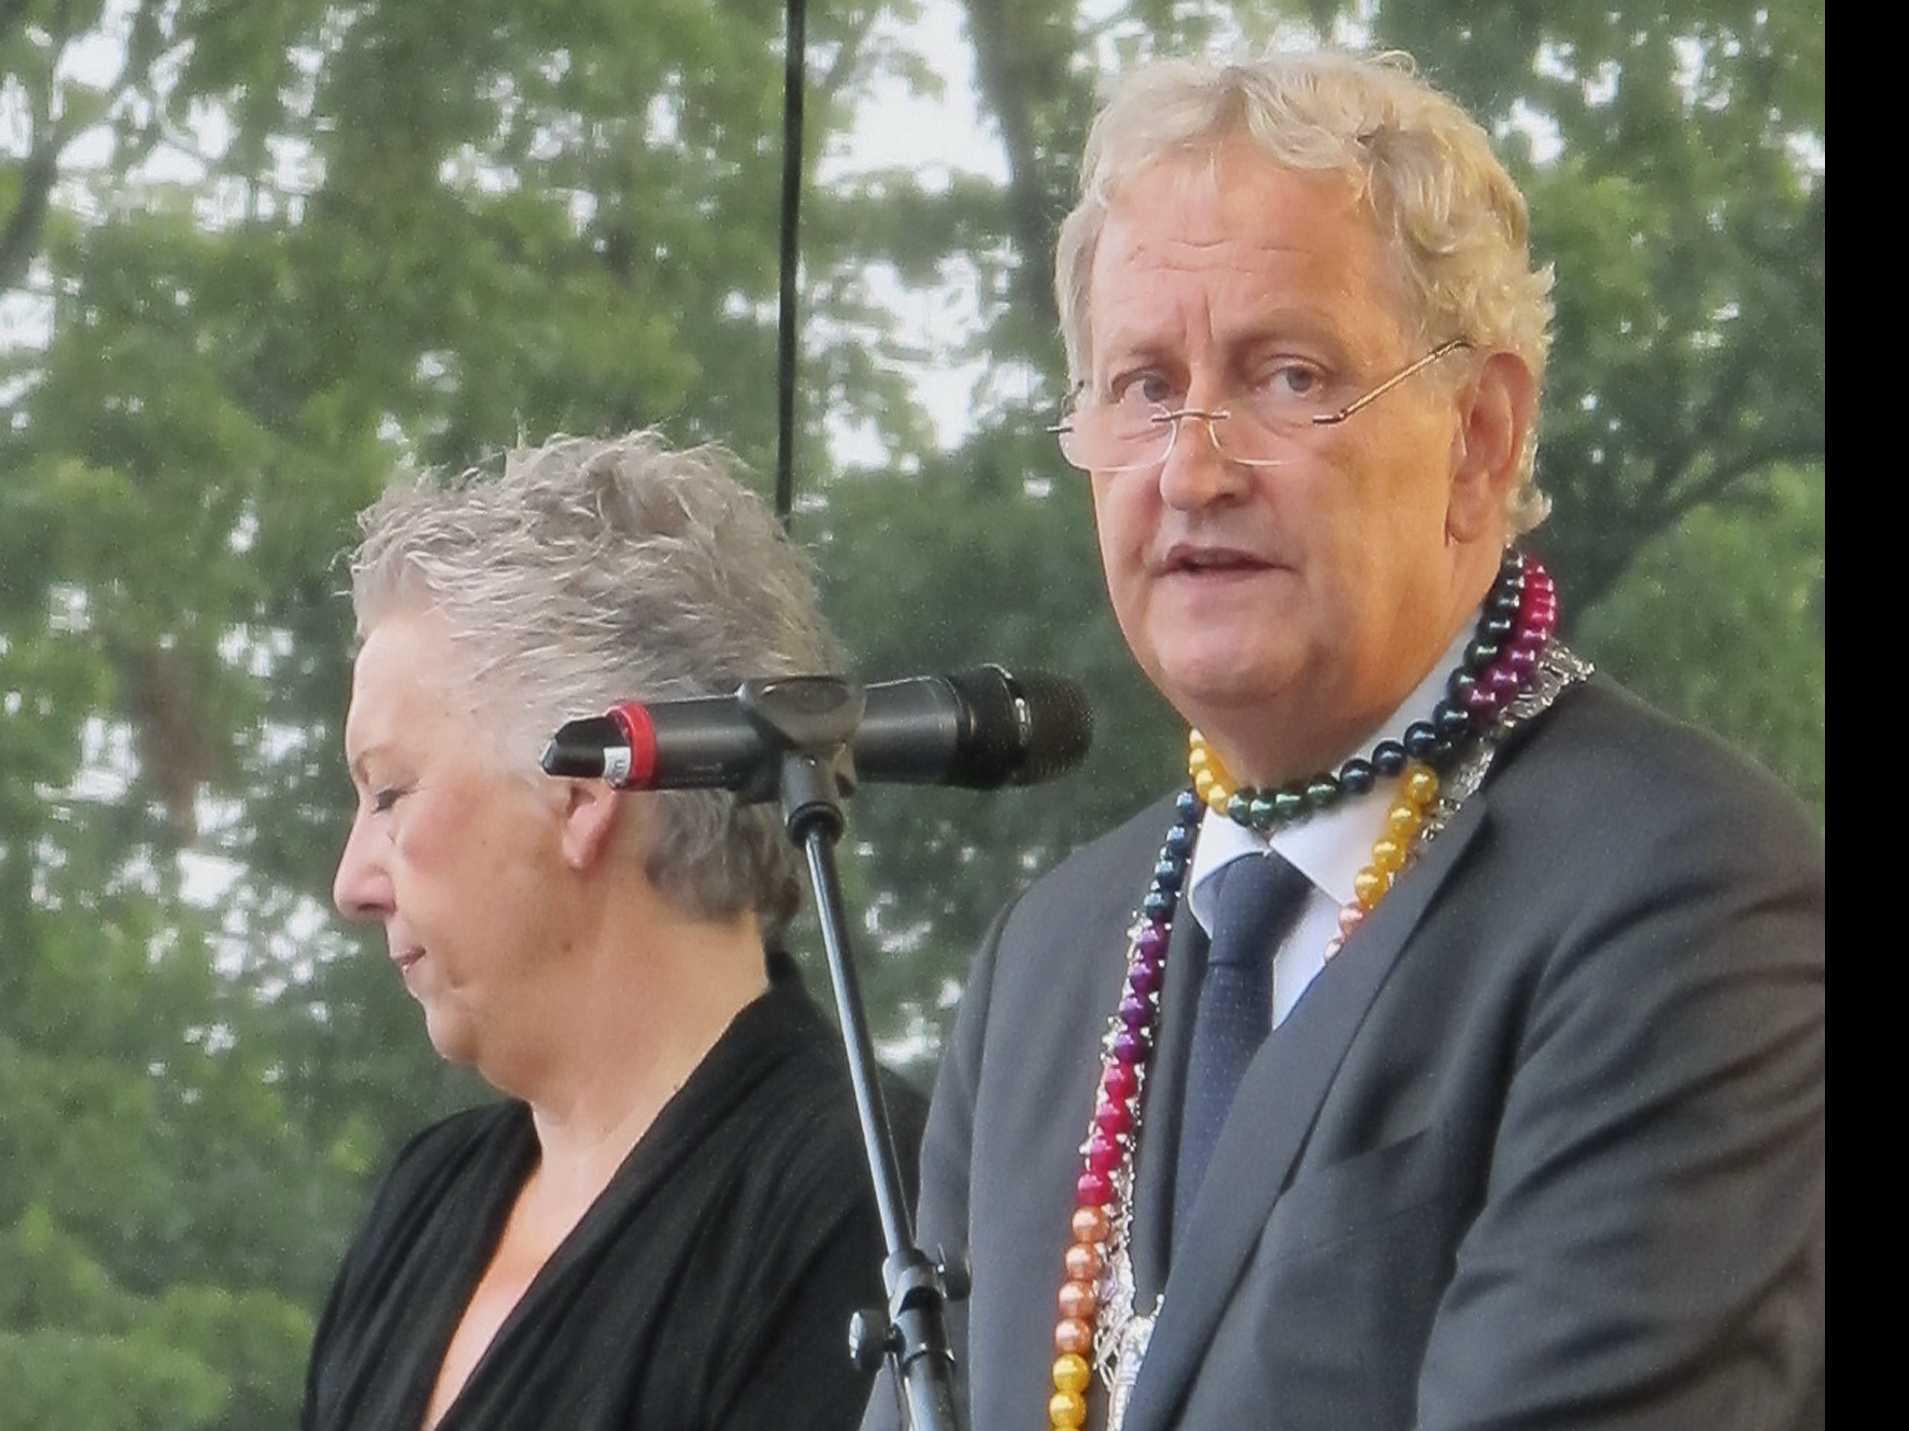 Popular Mayor of Amsterdam Dies After Battling Lung Cancer